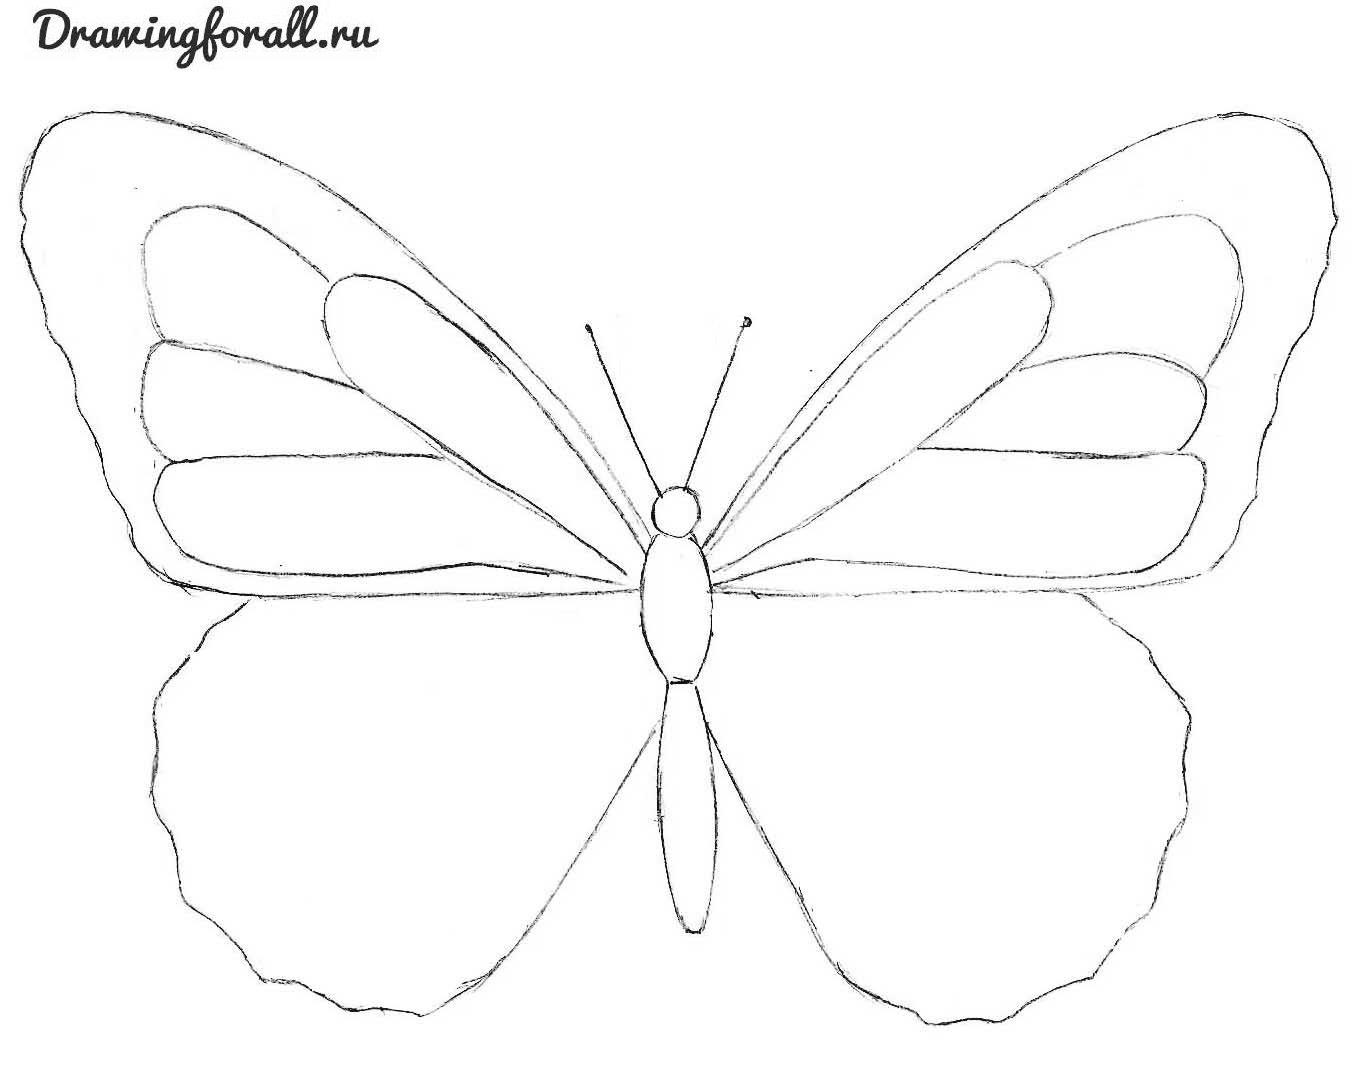 как красиво нарисовтать бабочку поэтапно